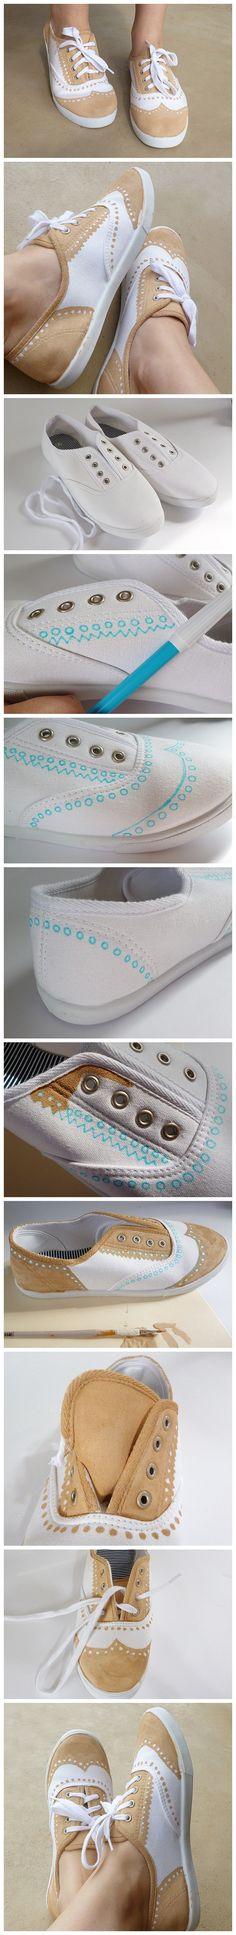 Shoes DIY.